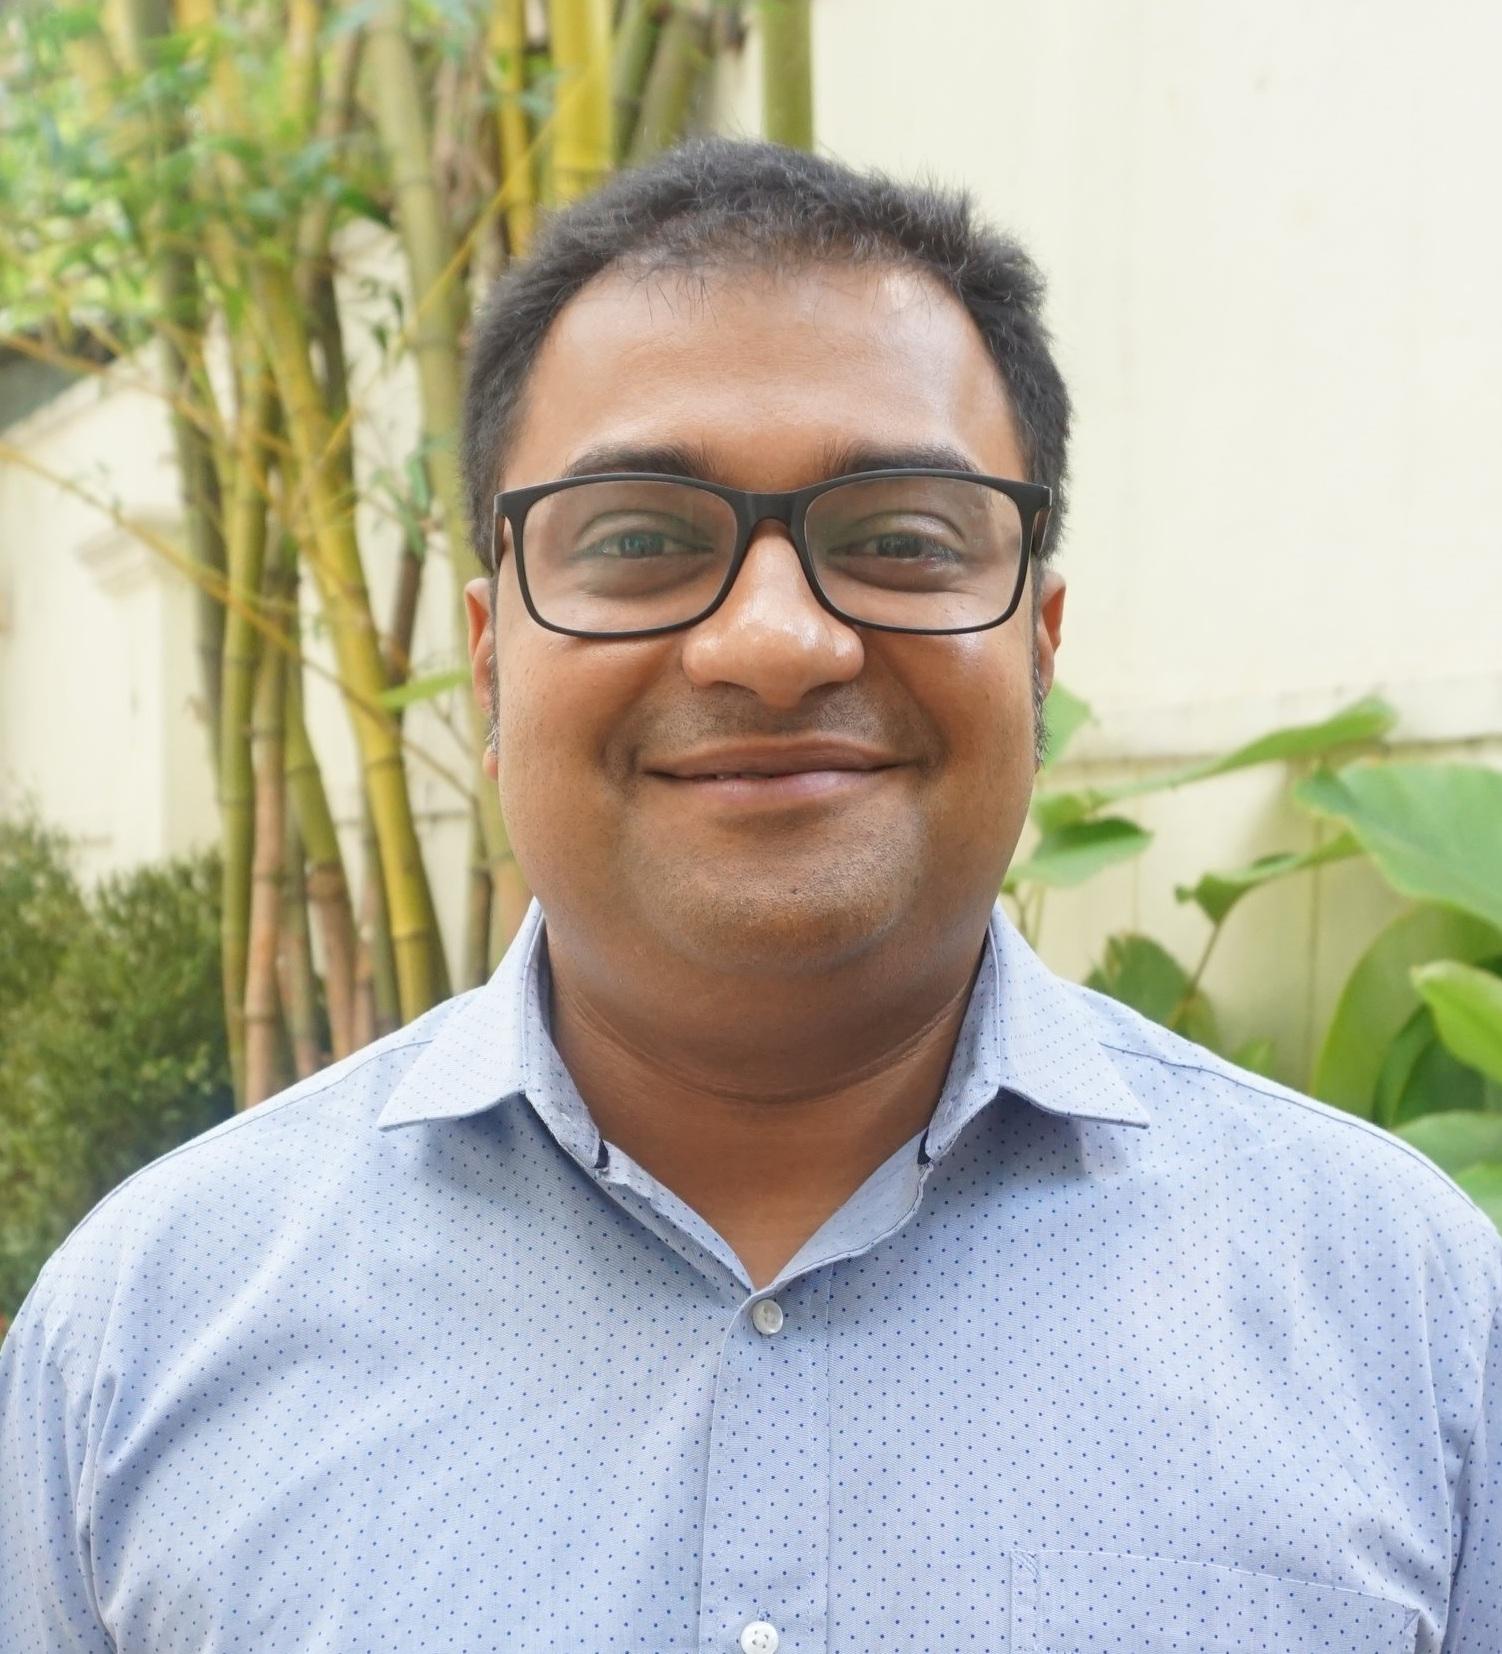 Amit Antony Alex, Upaya's India Country Director